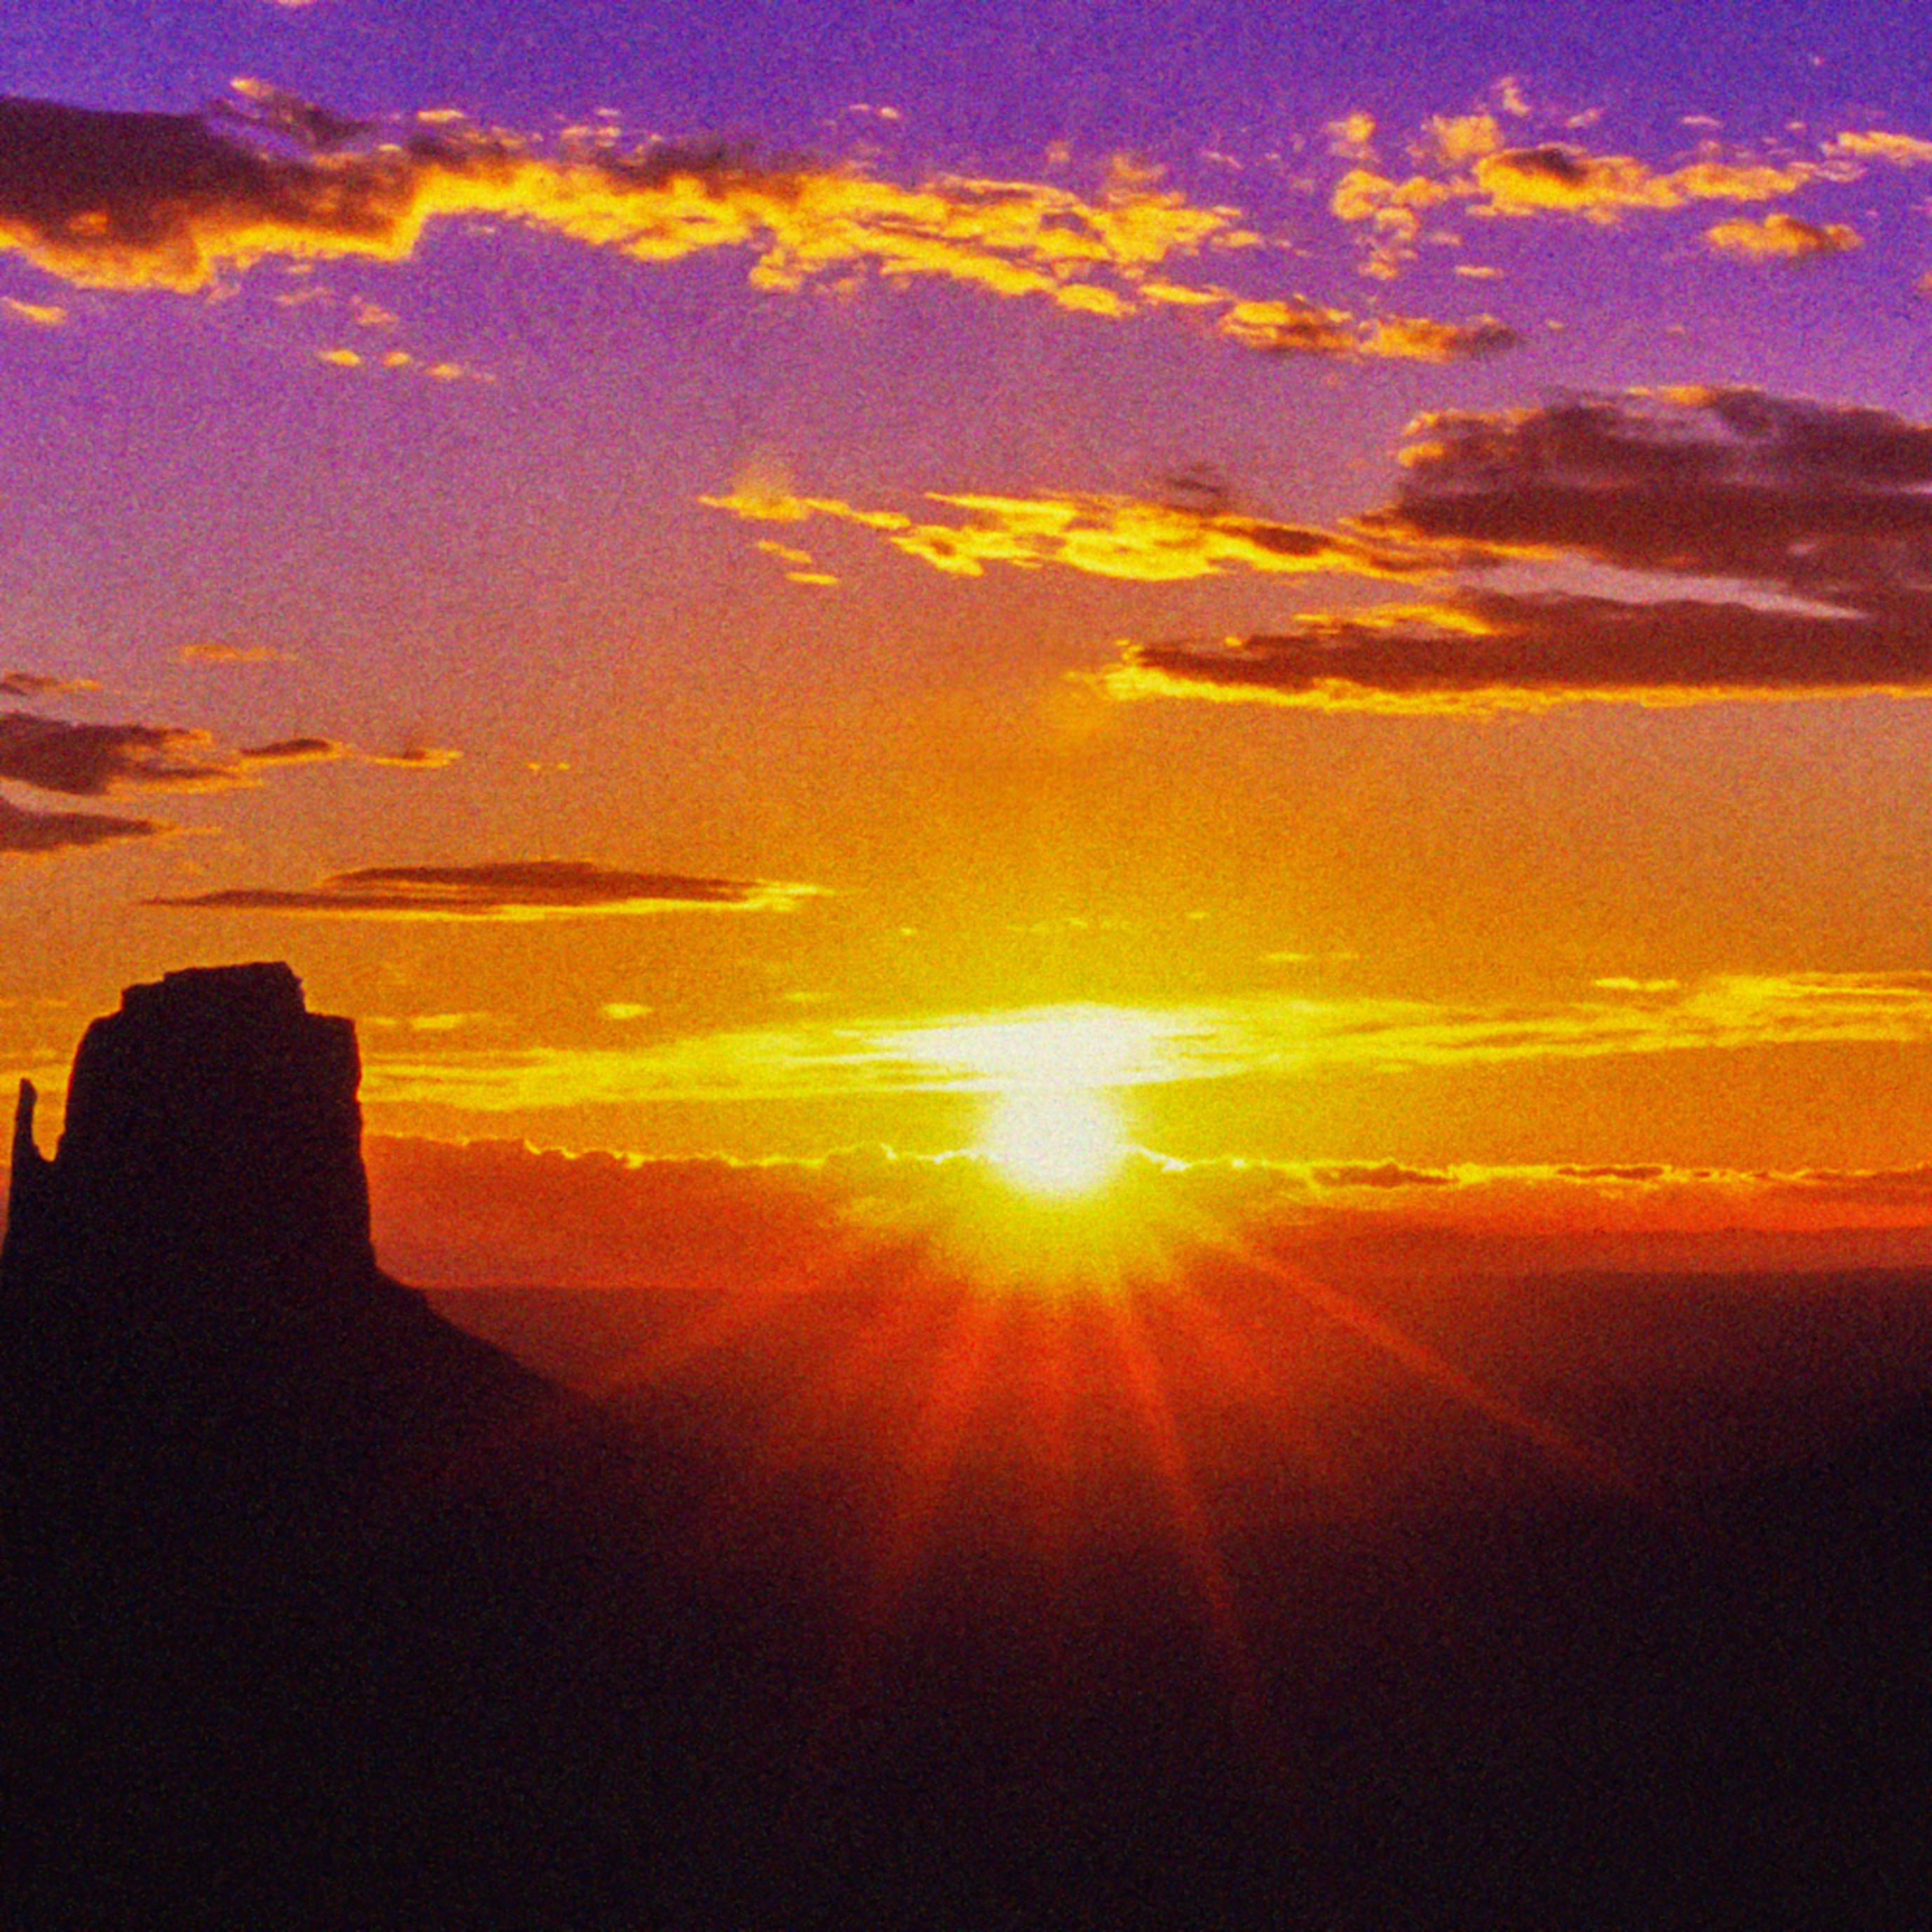 Monument valley sunrise az xnpv0m